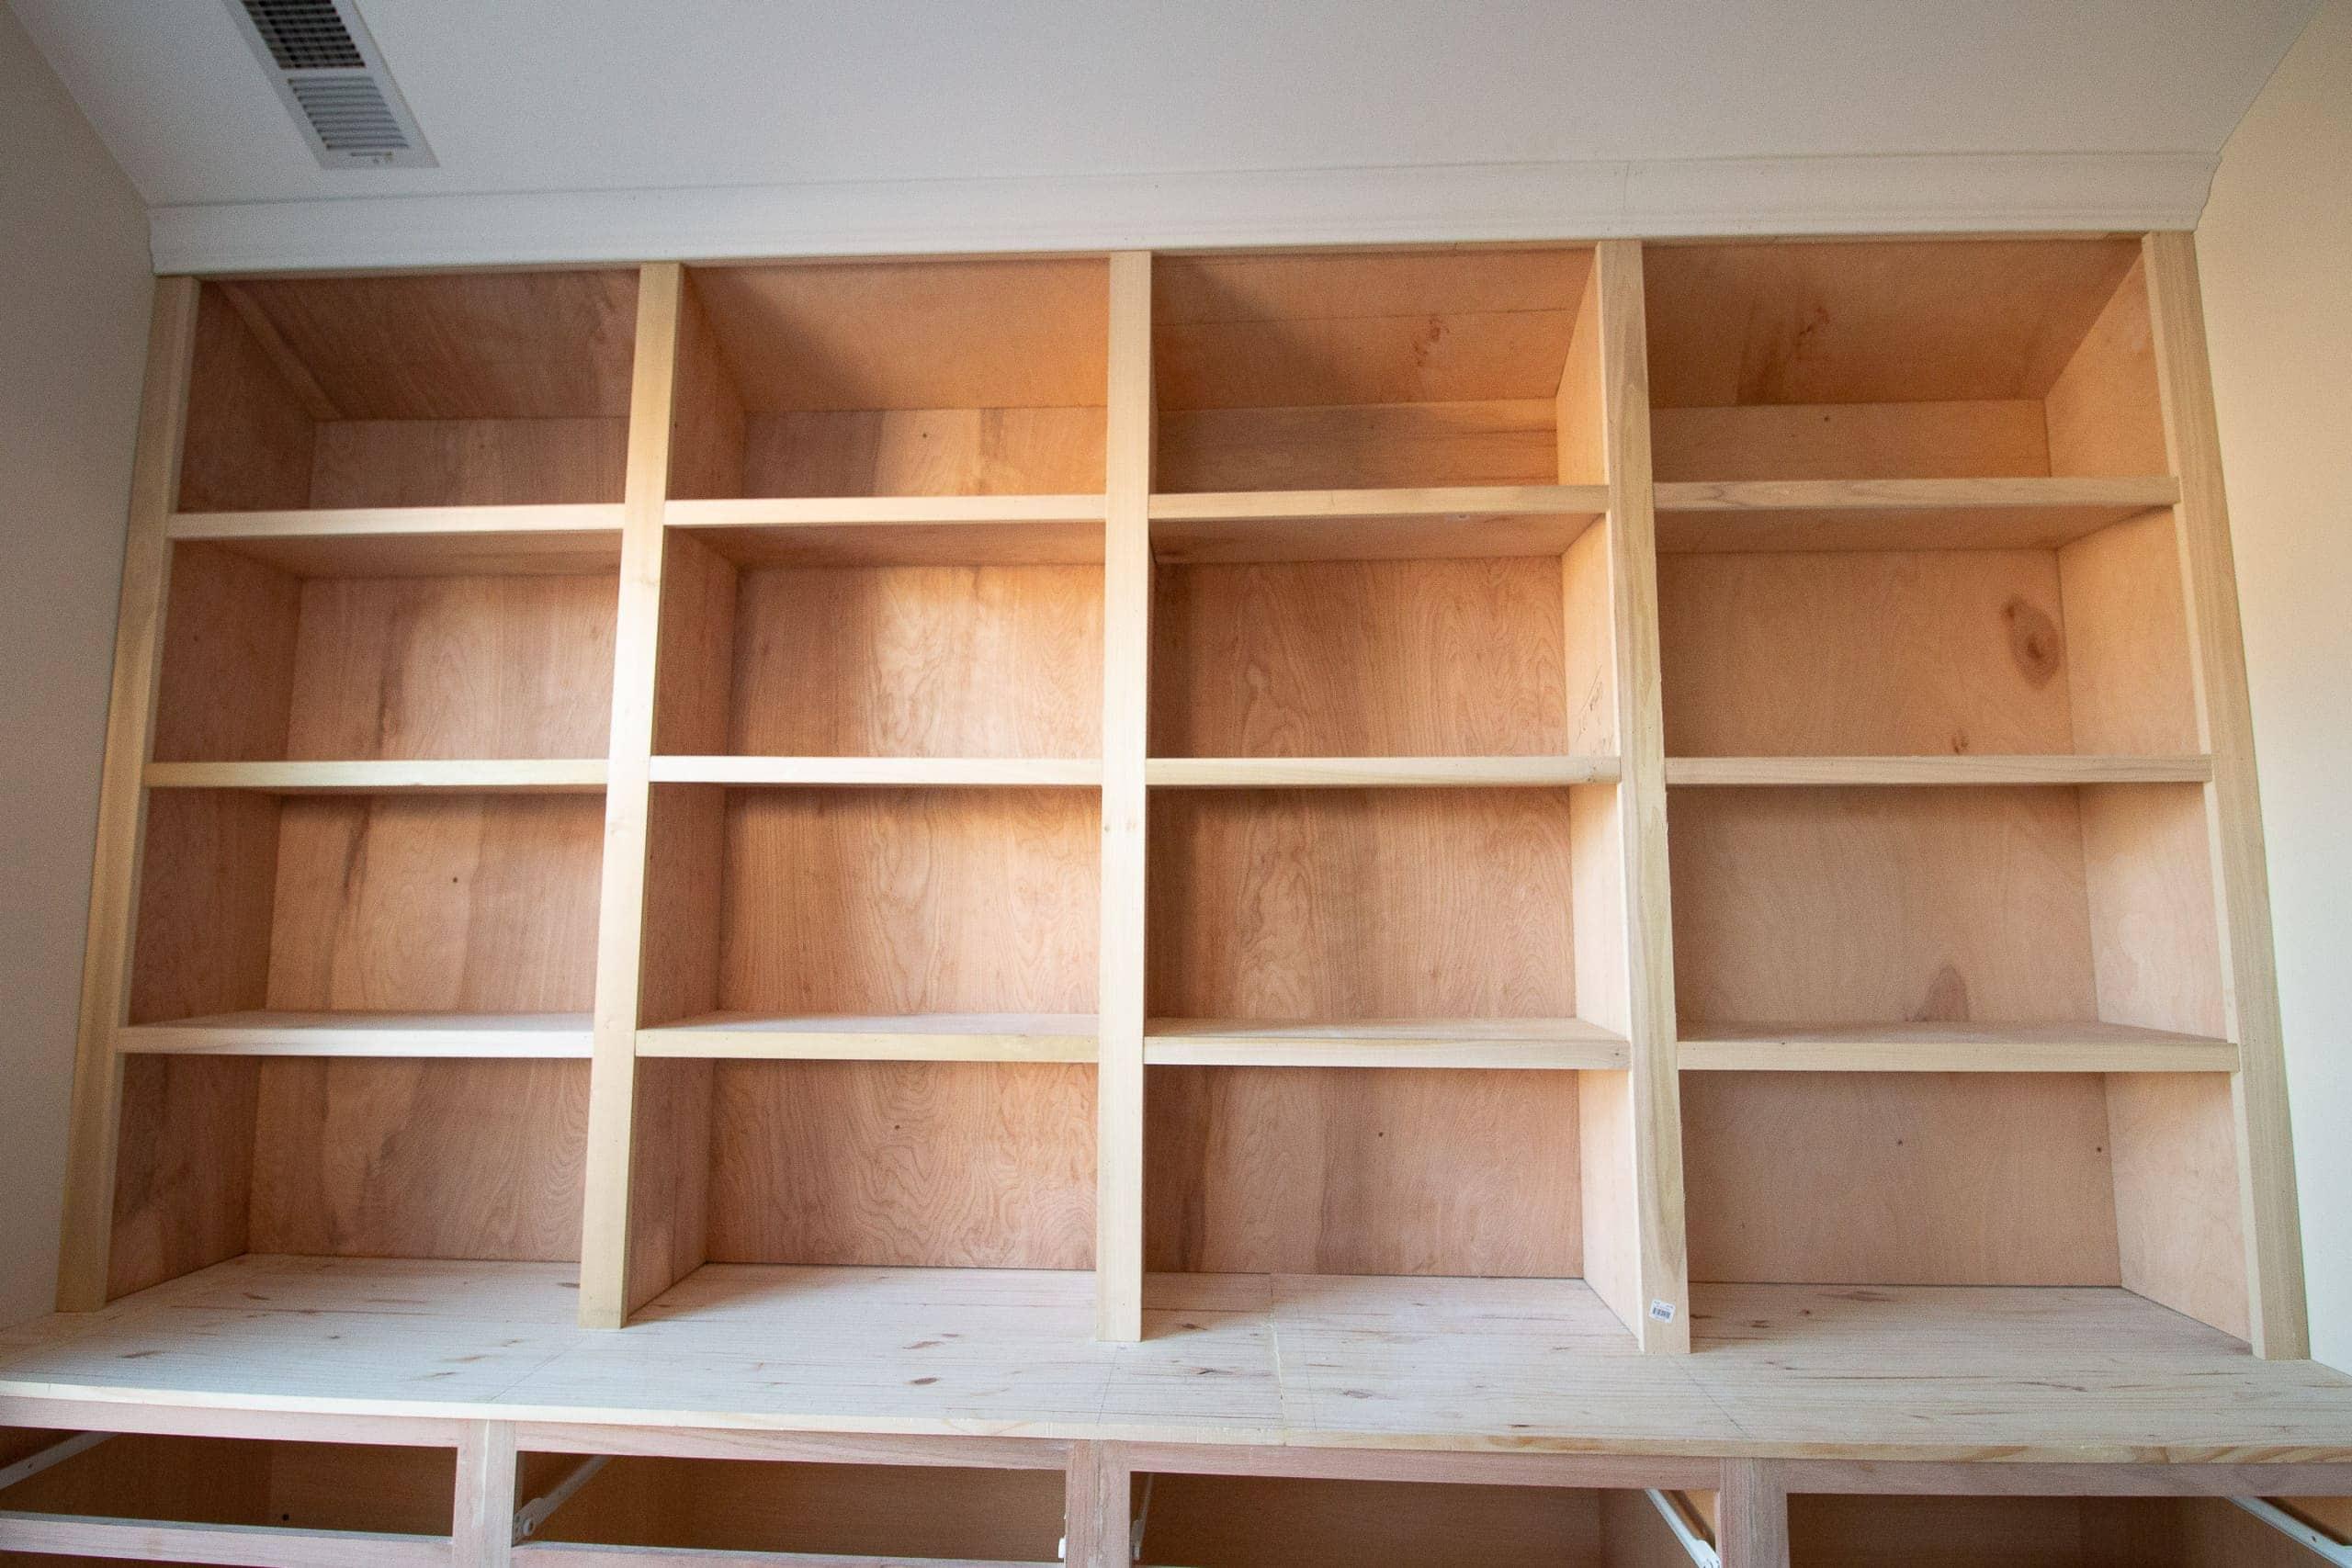 Raw wood built-ins